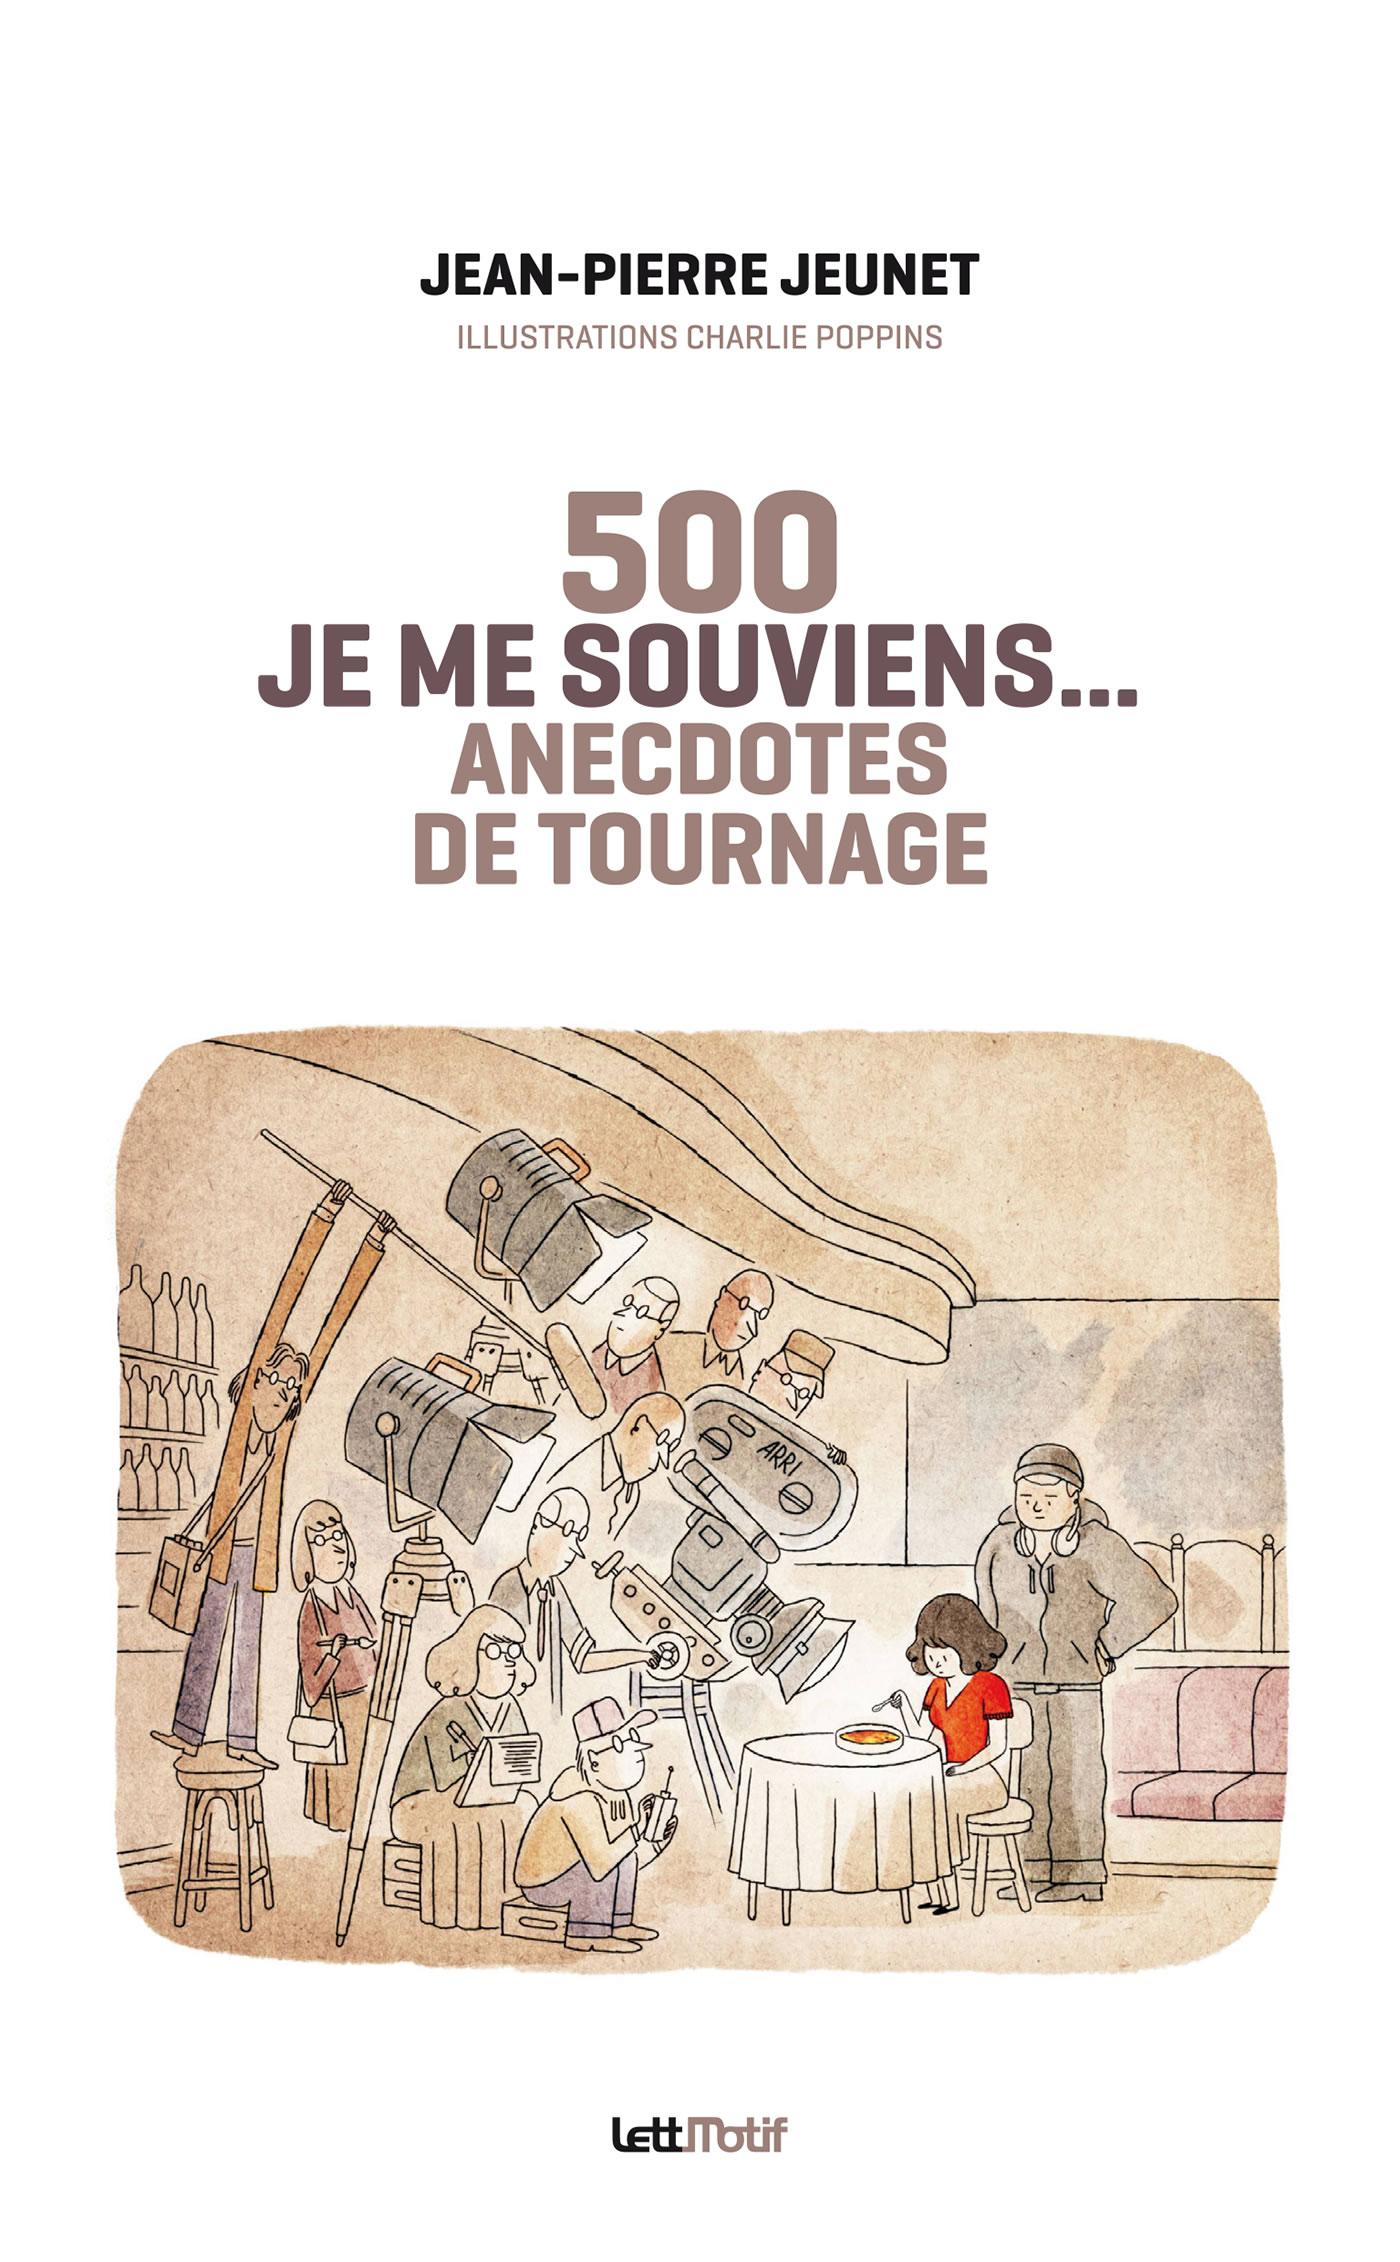 jemesouviens-1400